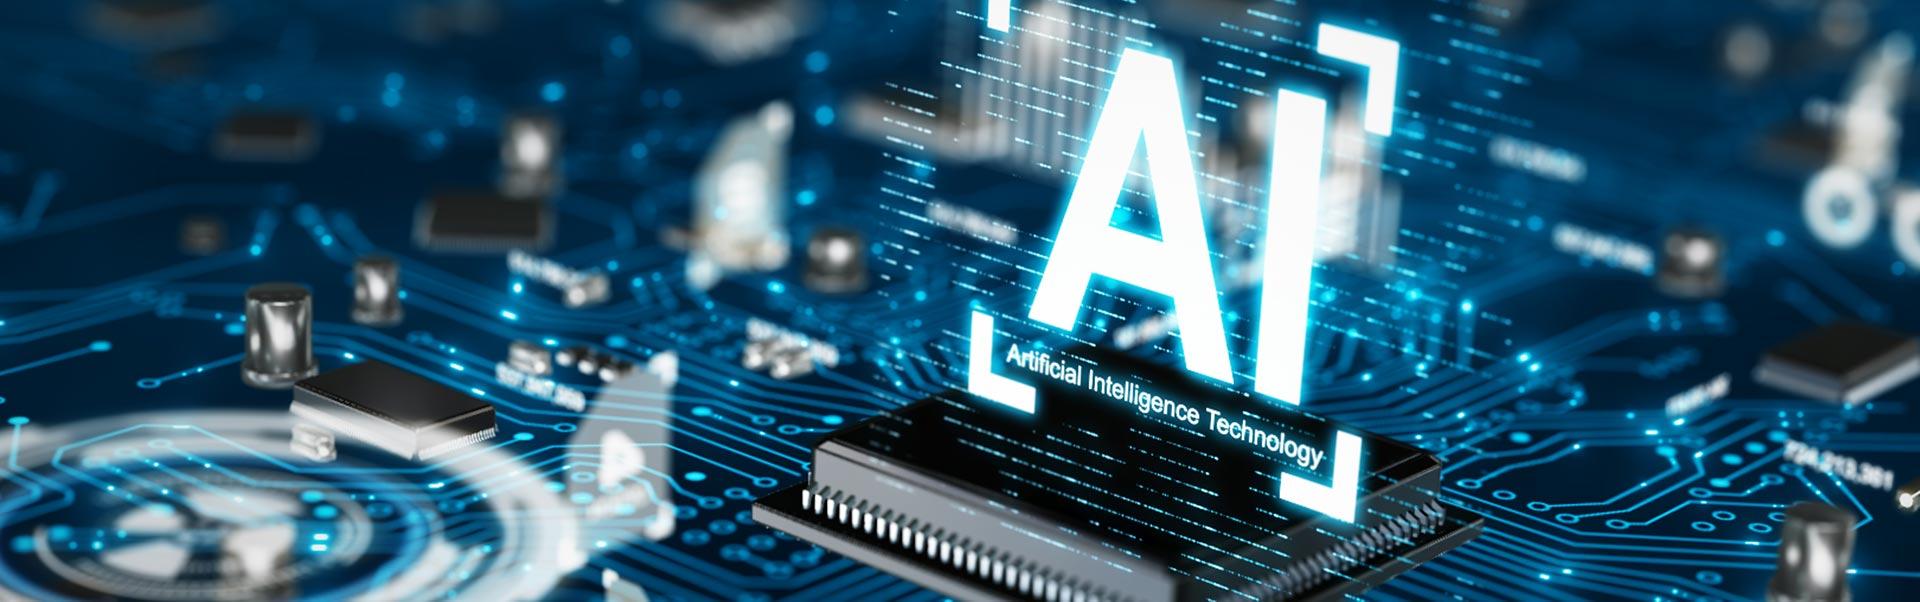 Artificial Intelligence und Robotics Process Automation